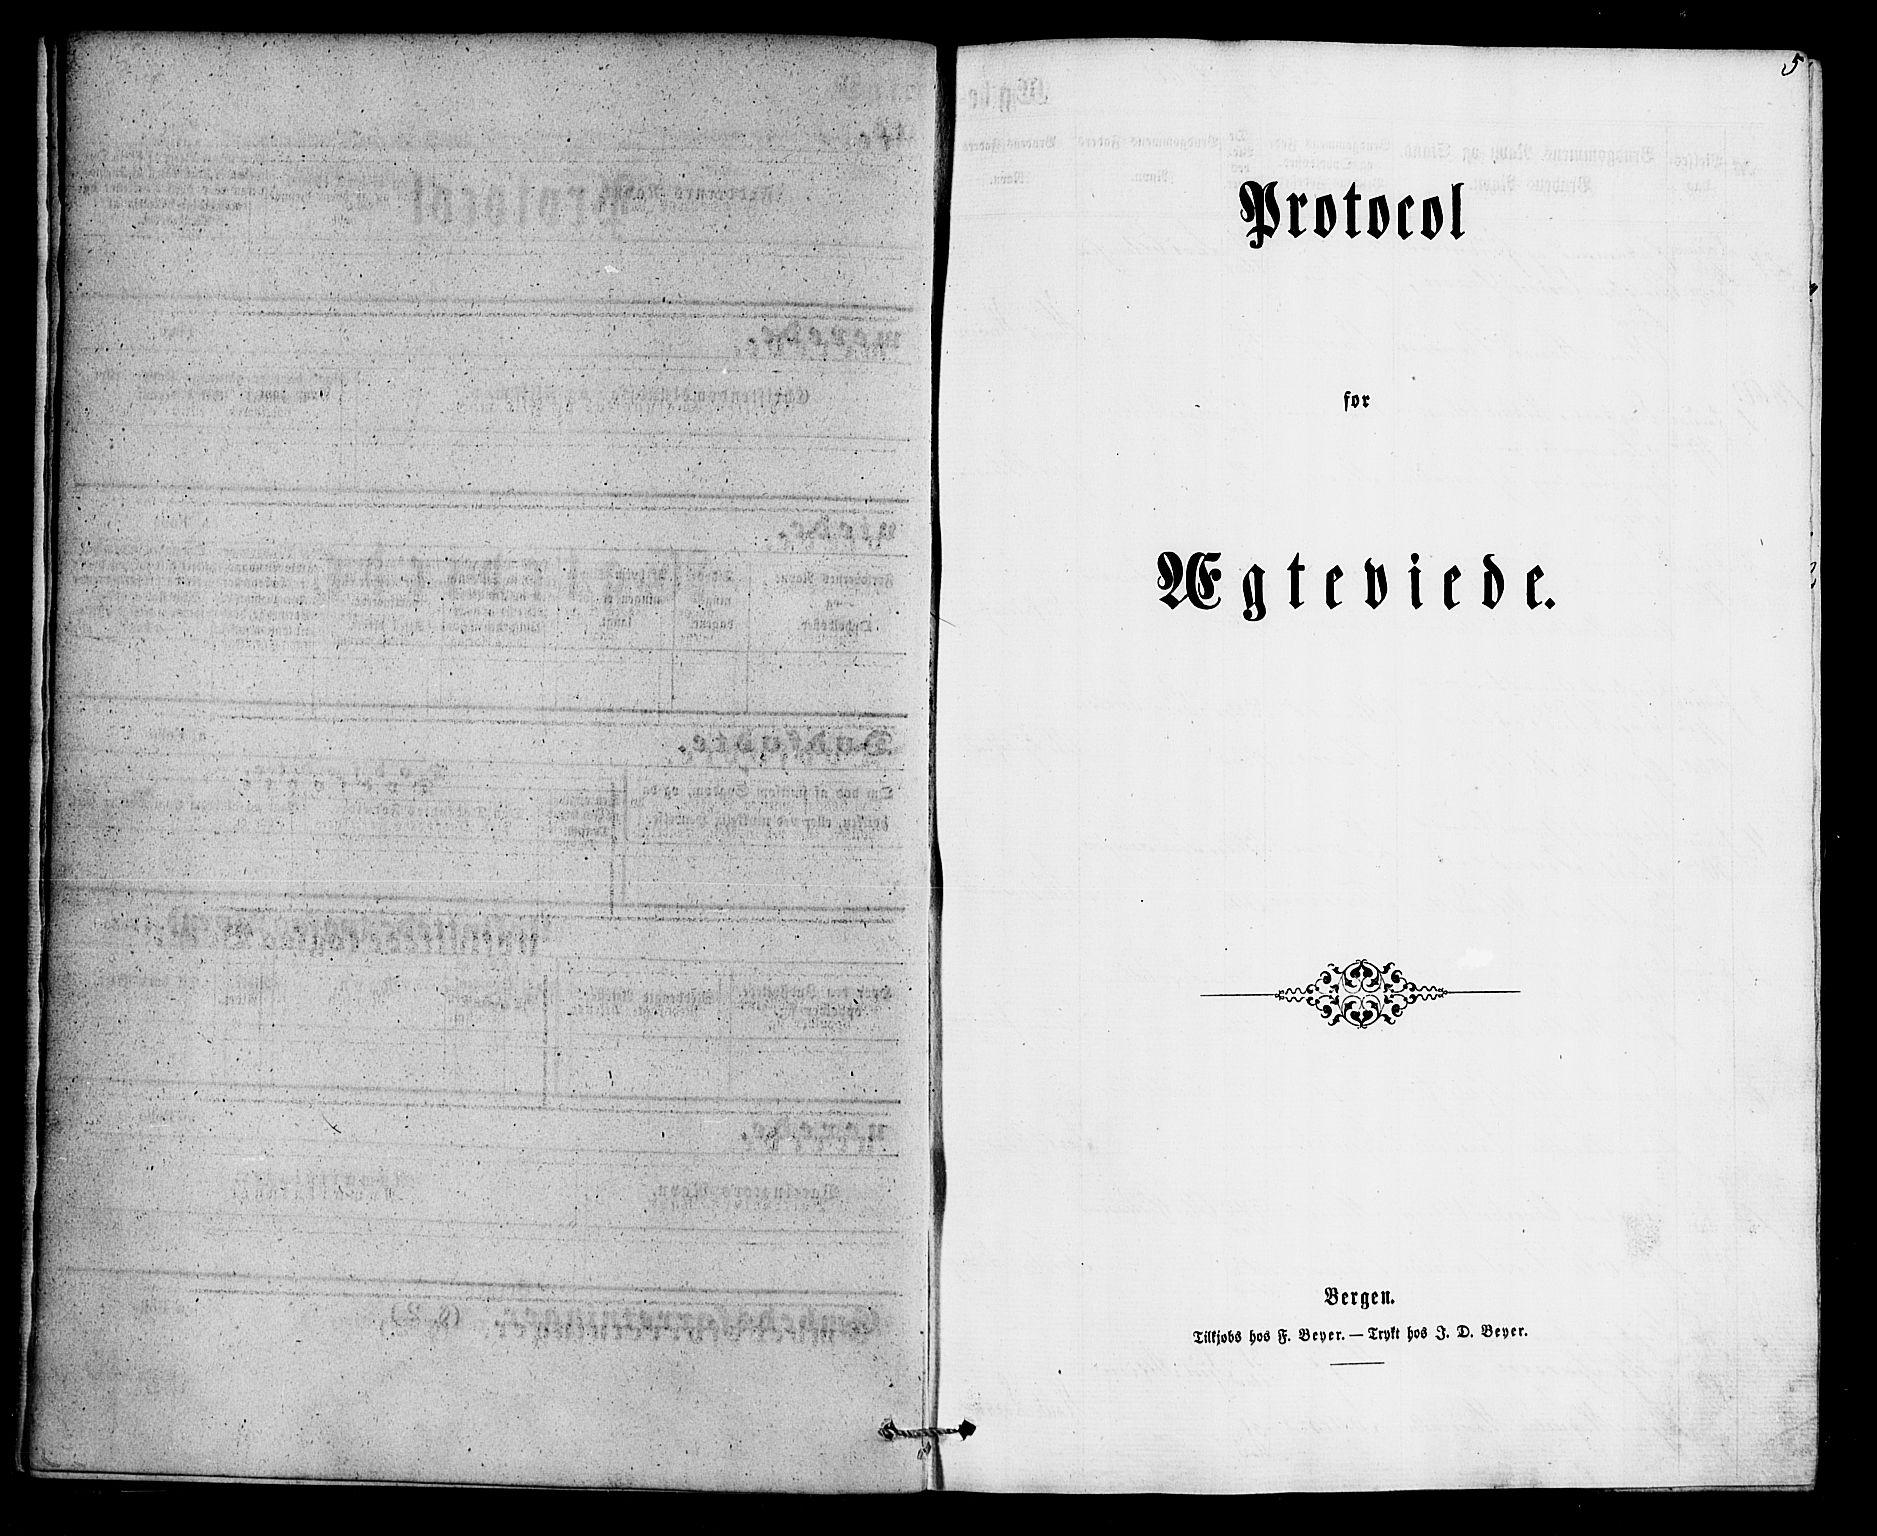 SAB, Aurland sokneprestembete, H/Ha/Haa/L0010: Ministerialbok nr. A 10, 1859-1879, s. 5